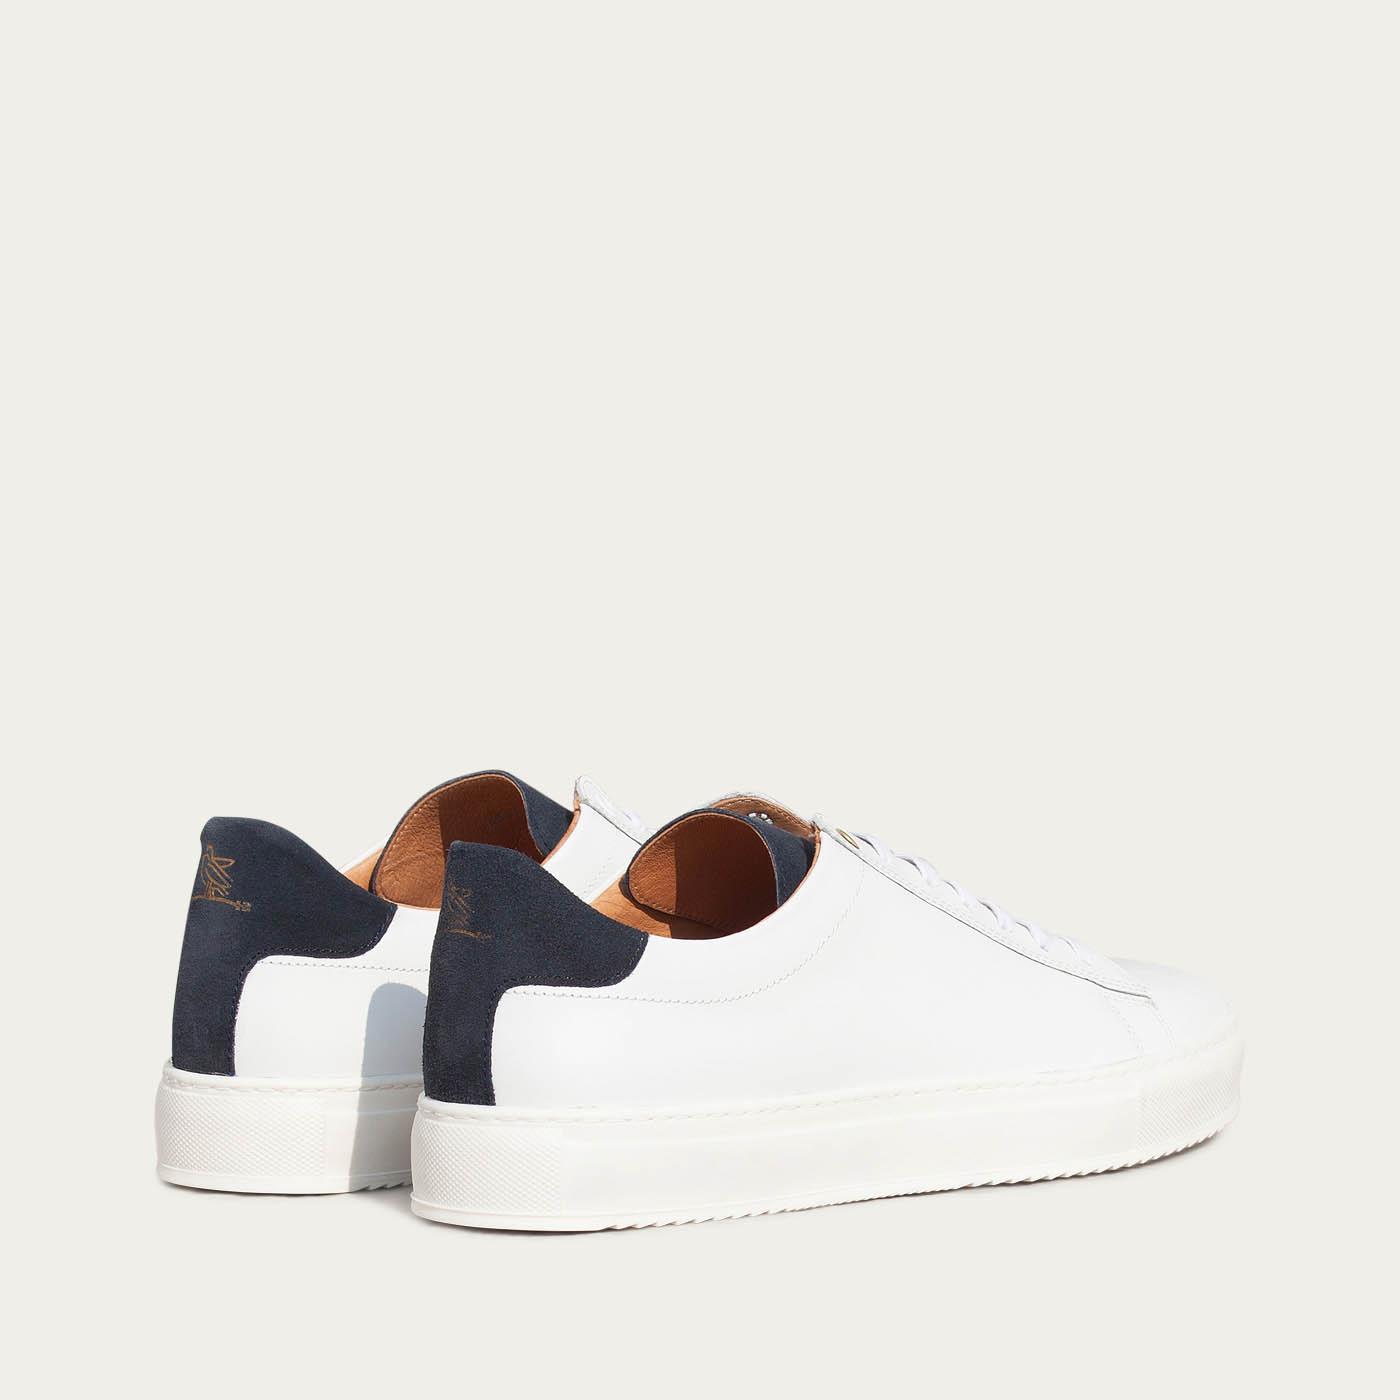 Porte Bleue Calf Taranta Sneakers 2